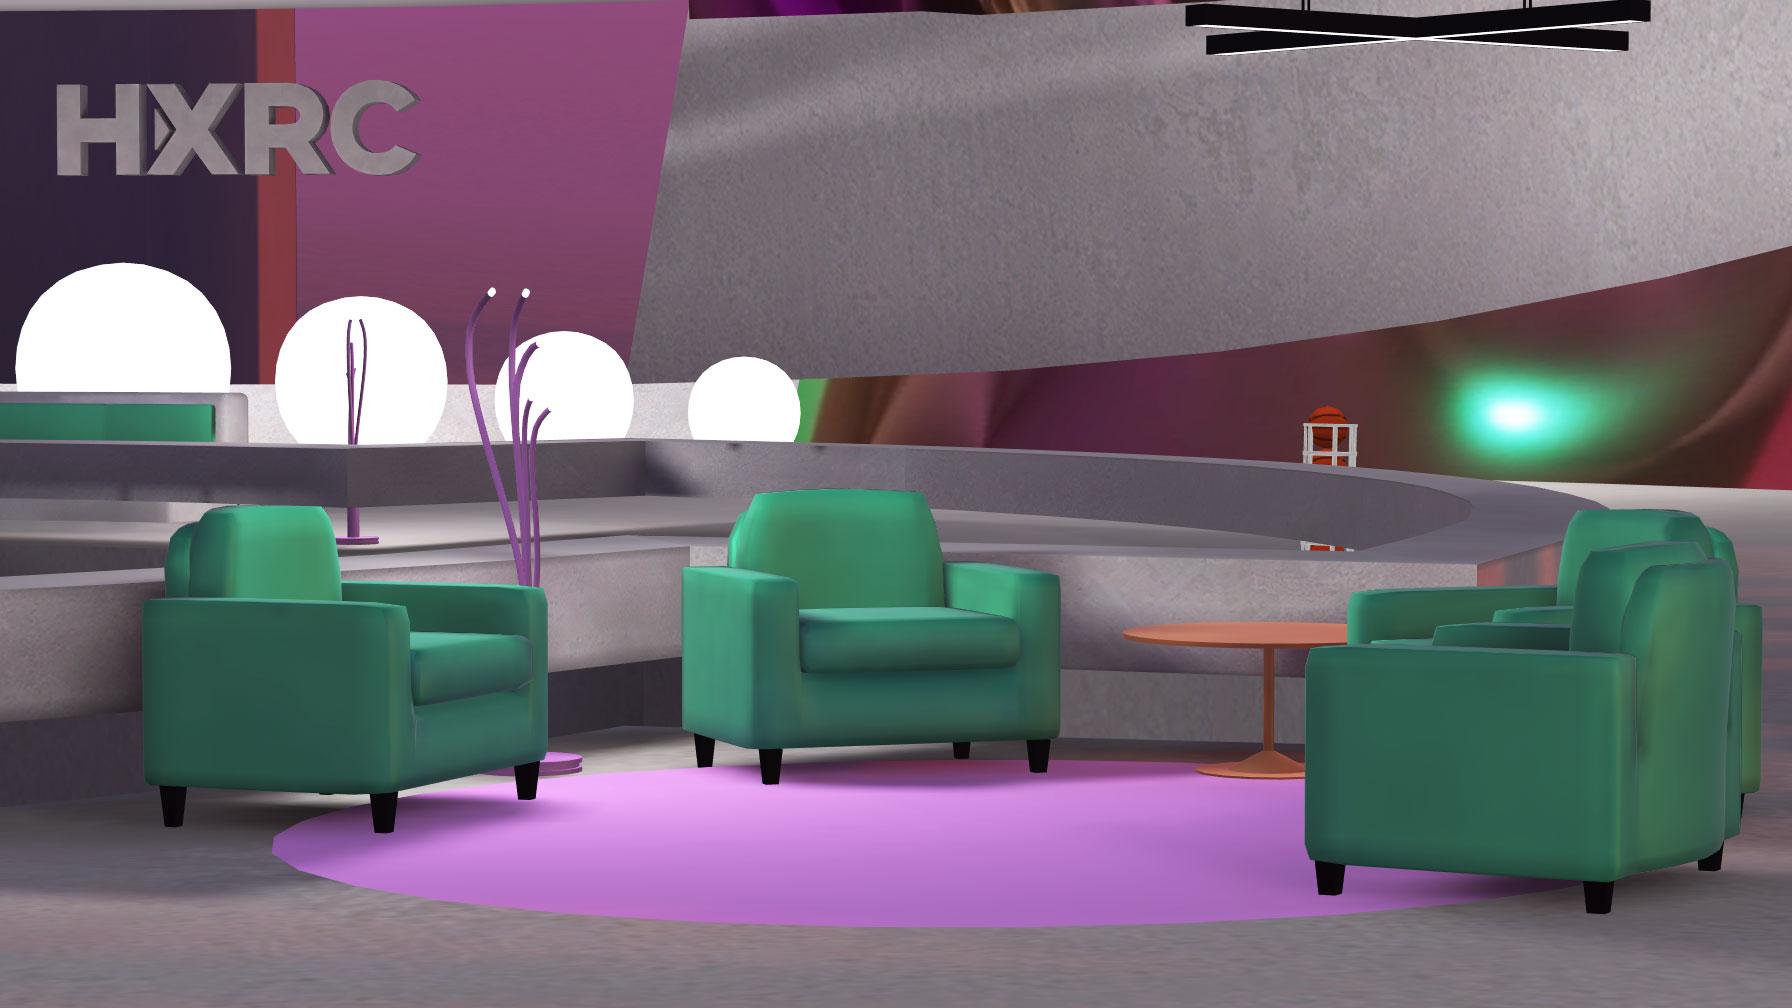 AtspaceVR screenshot: green couches in a virtual venue.